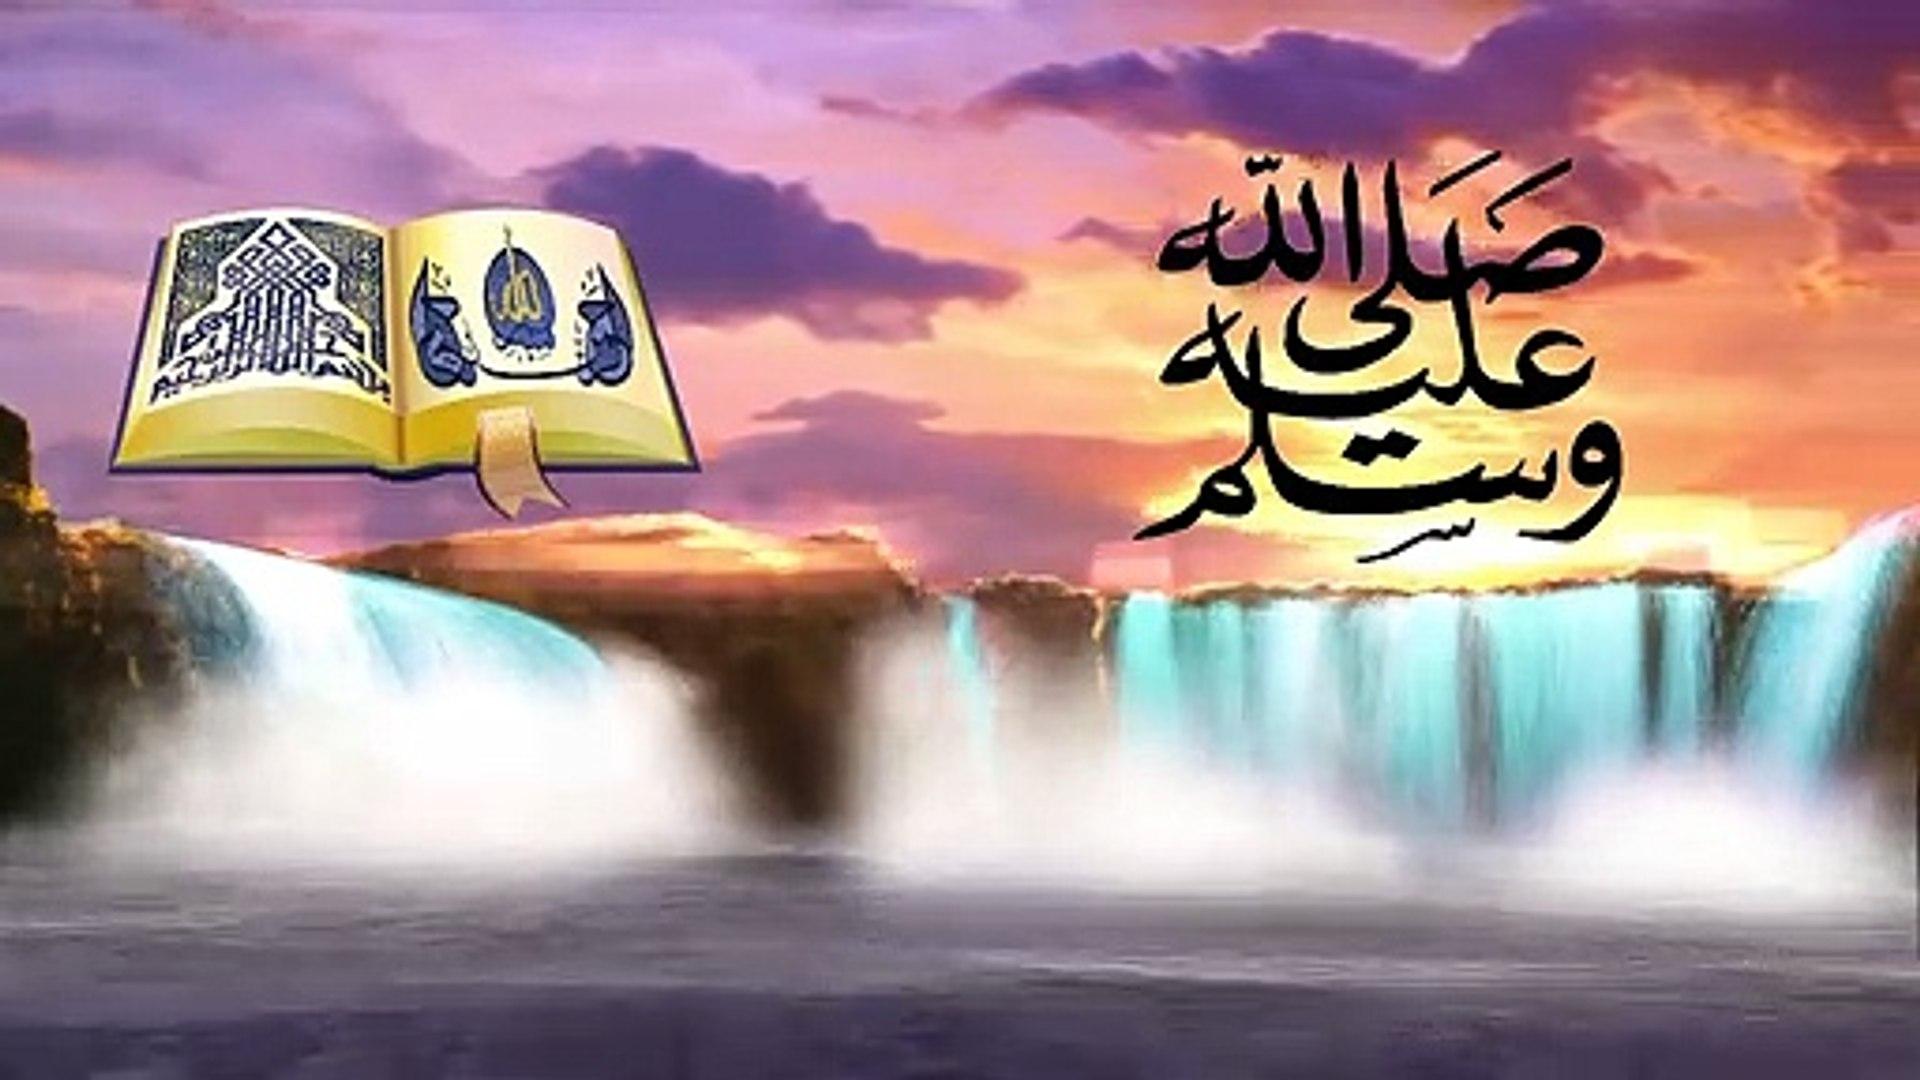 Arabic_naat_ whatsapp status 2020 | islamic_Arabi_whatsapp_status_naat_2020 | Islamic Arabic Whatsap